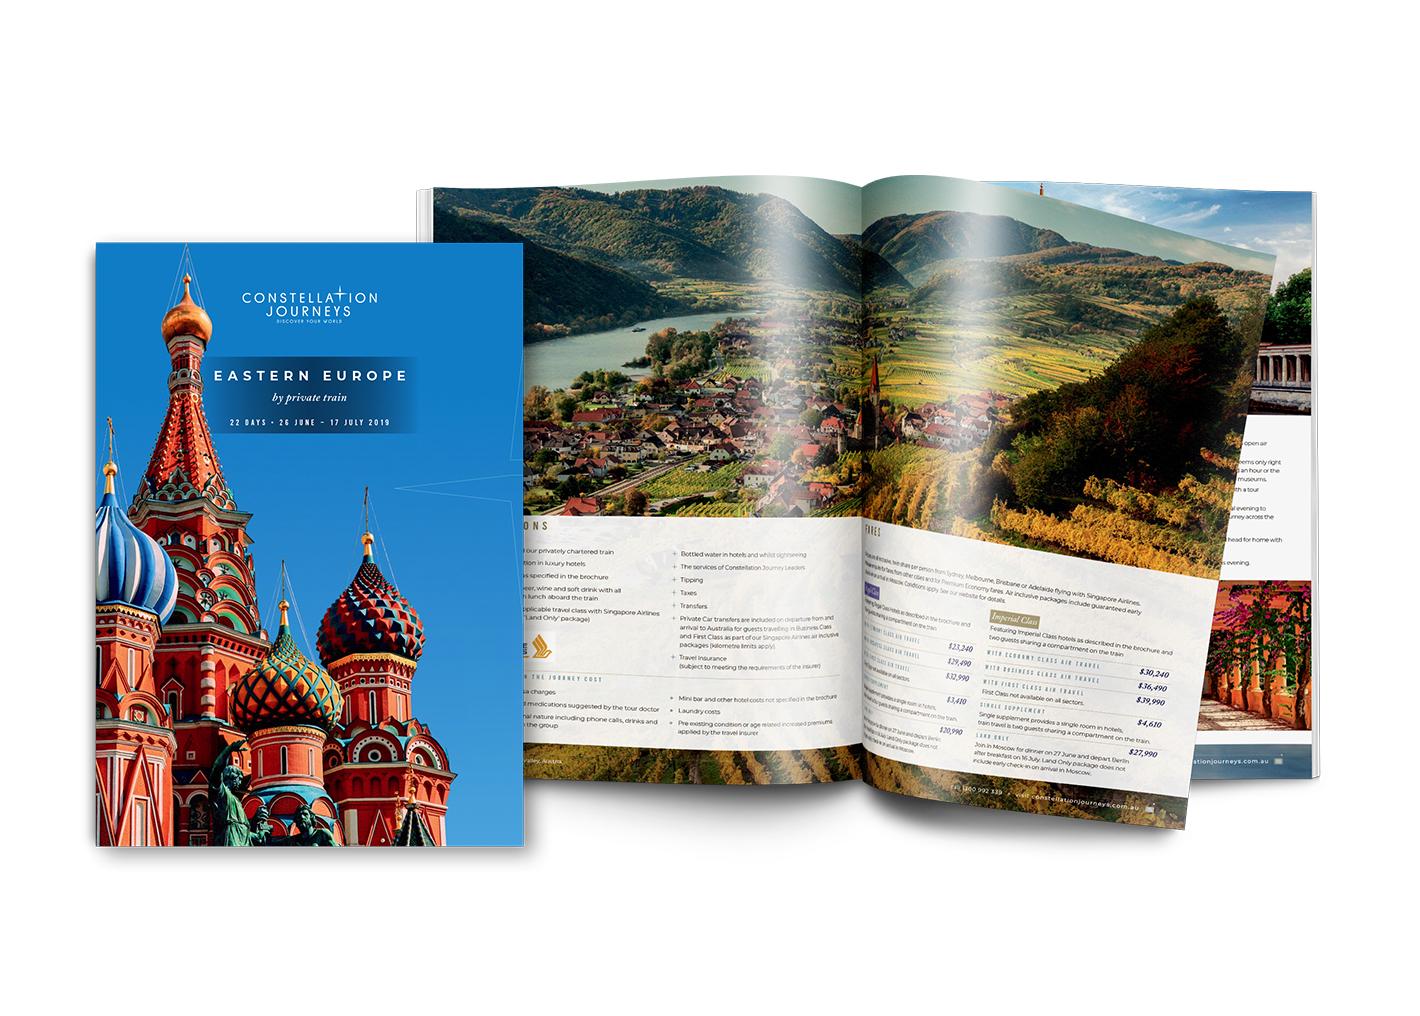 Constellation Journeys Europe Brochure